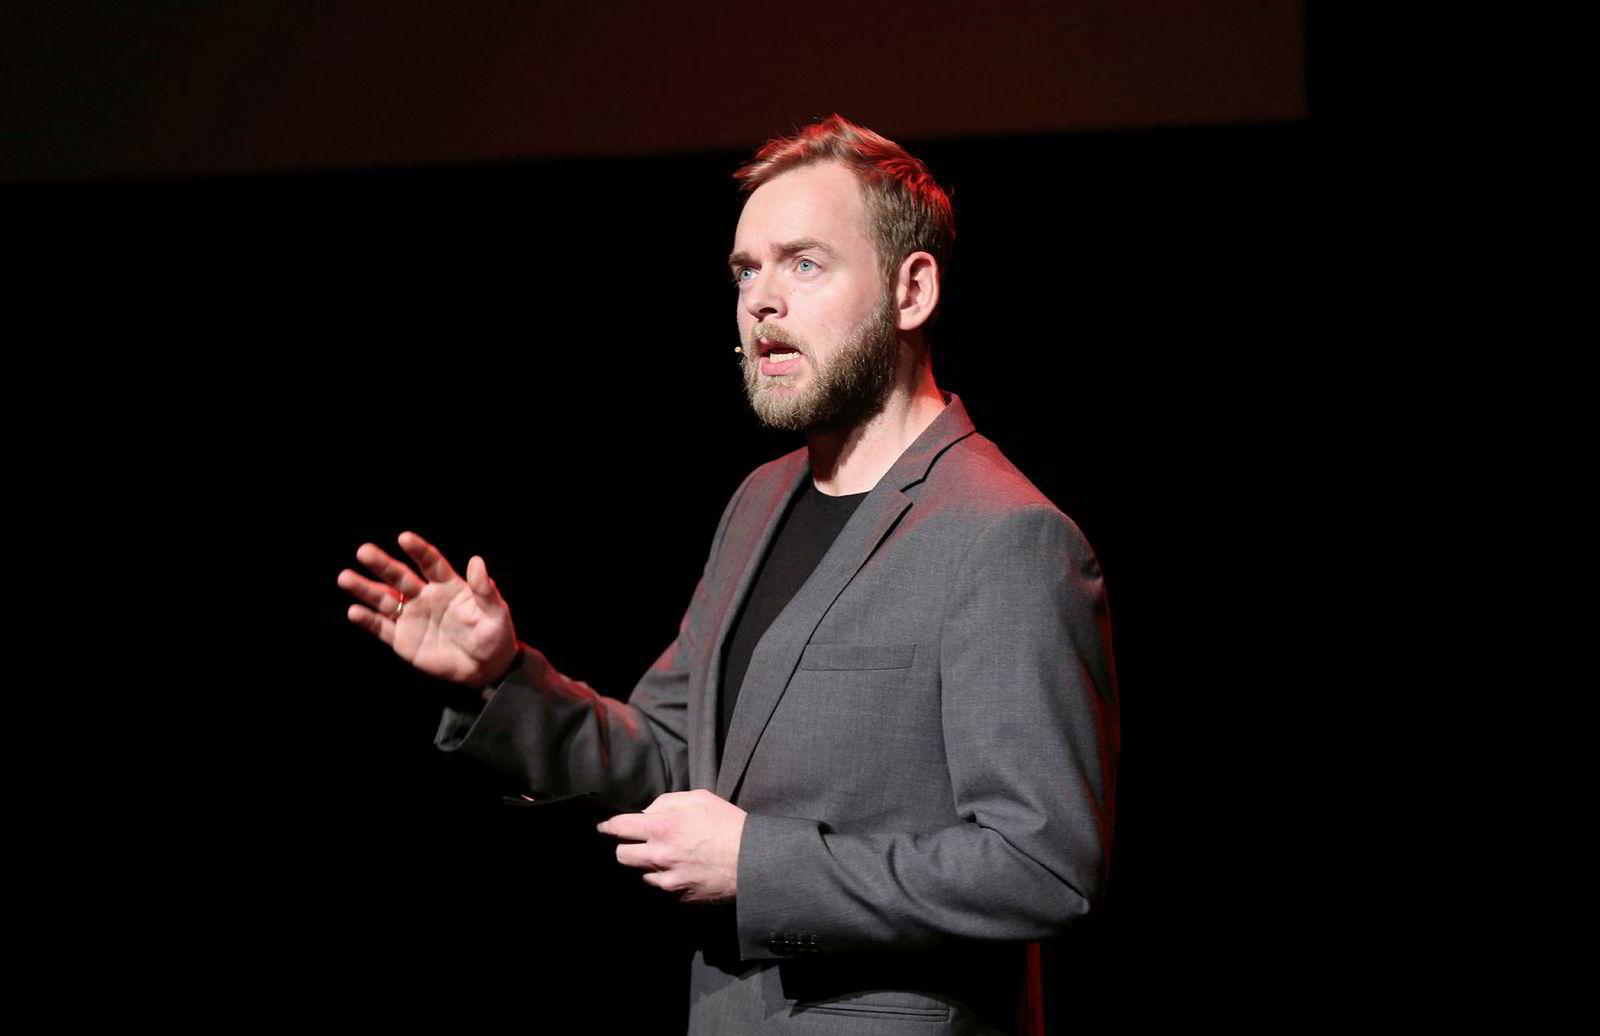 Oslo 20161123. Brageprisen 2016. Programleder er Tore Sagen. Foto: Vidar Ruud / NTB scanpix